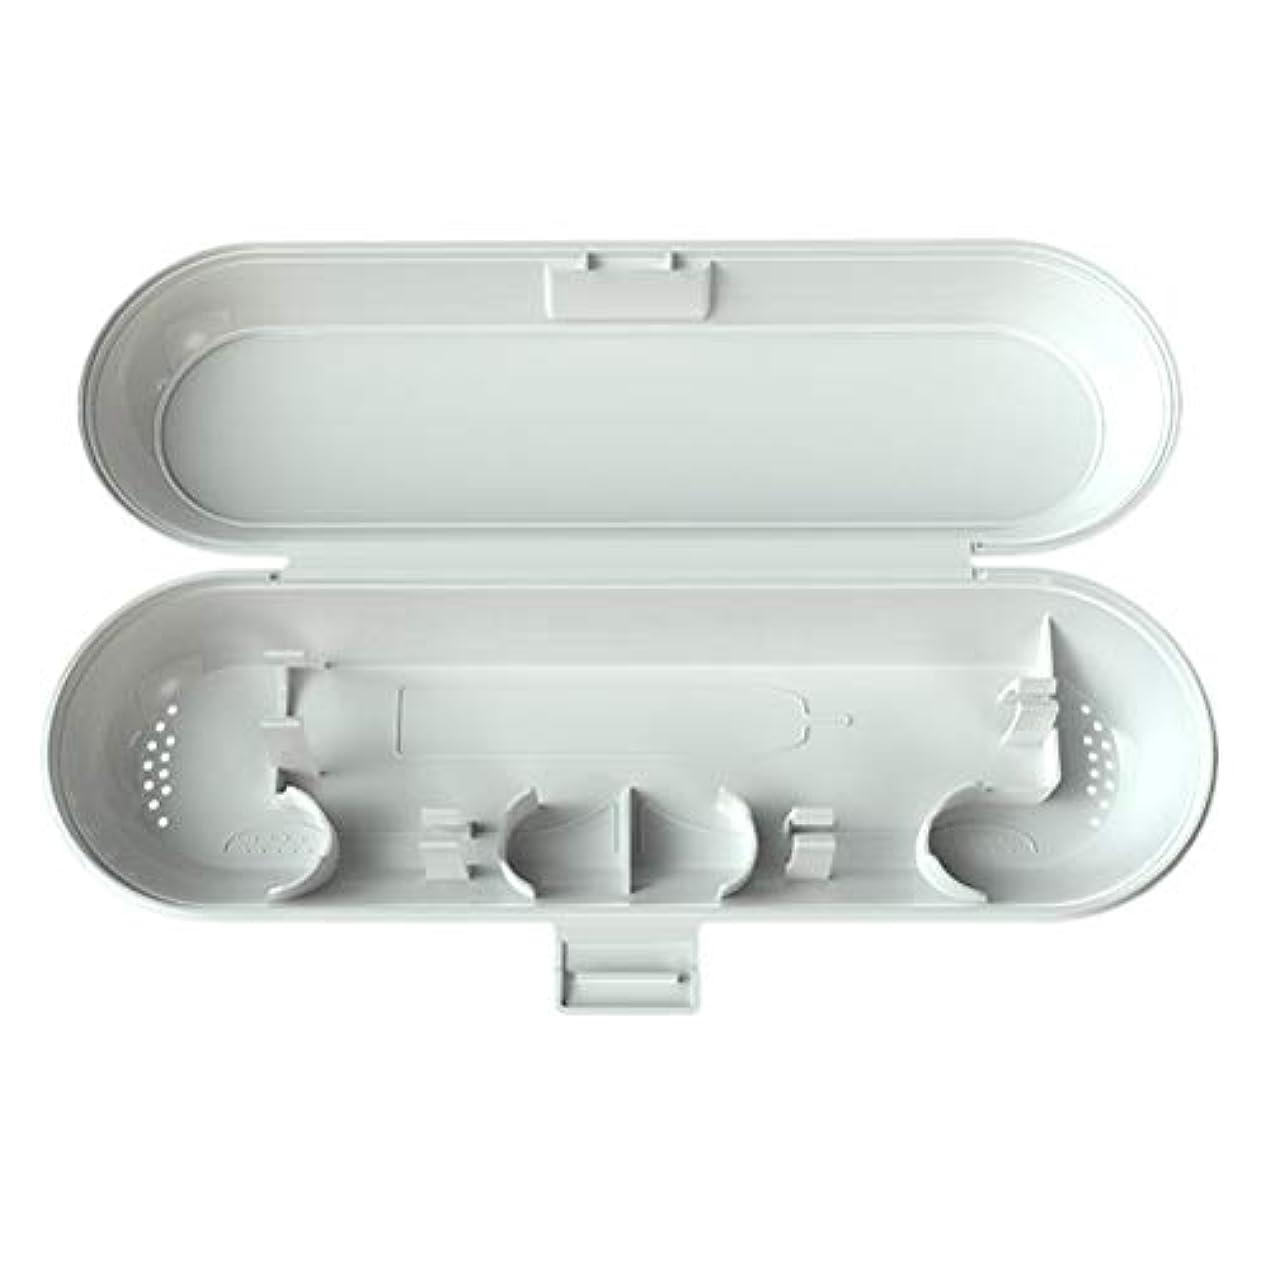 TOPBATHYポータブルプラスチック製電動歯ブラシケースキャンプ用トラベルブラシトラベルボックス(ホワイト)